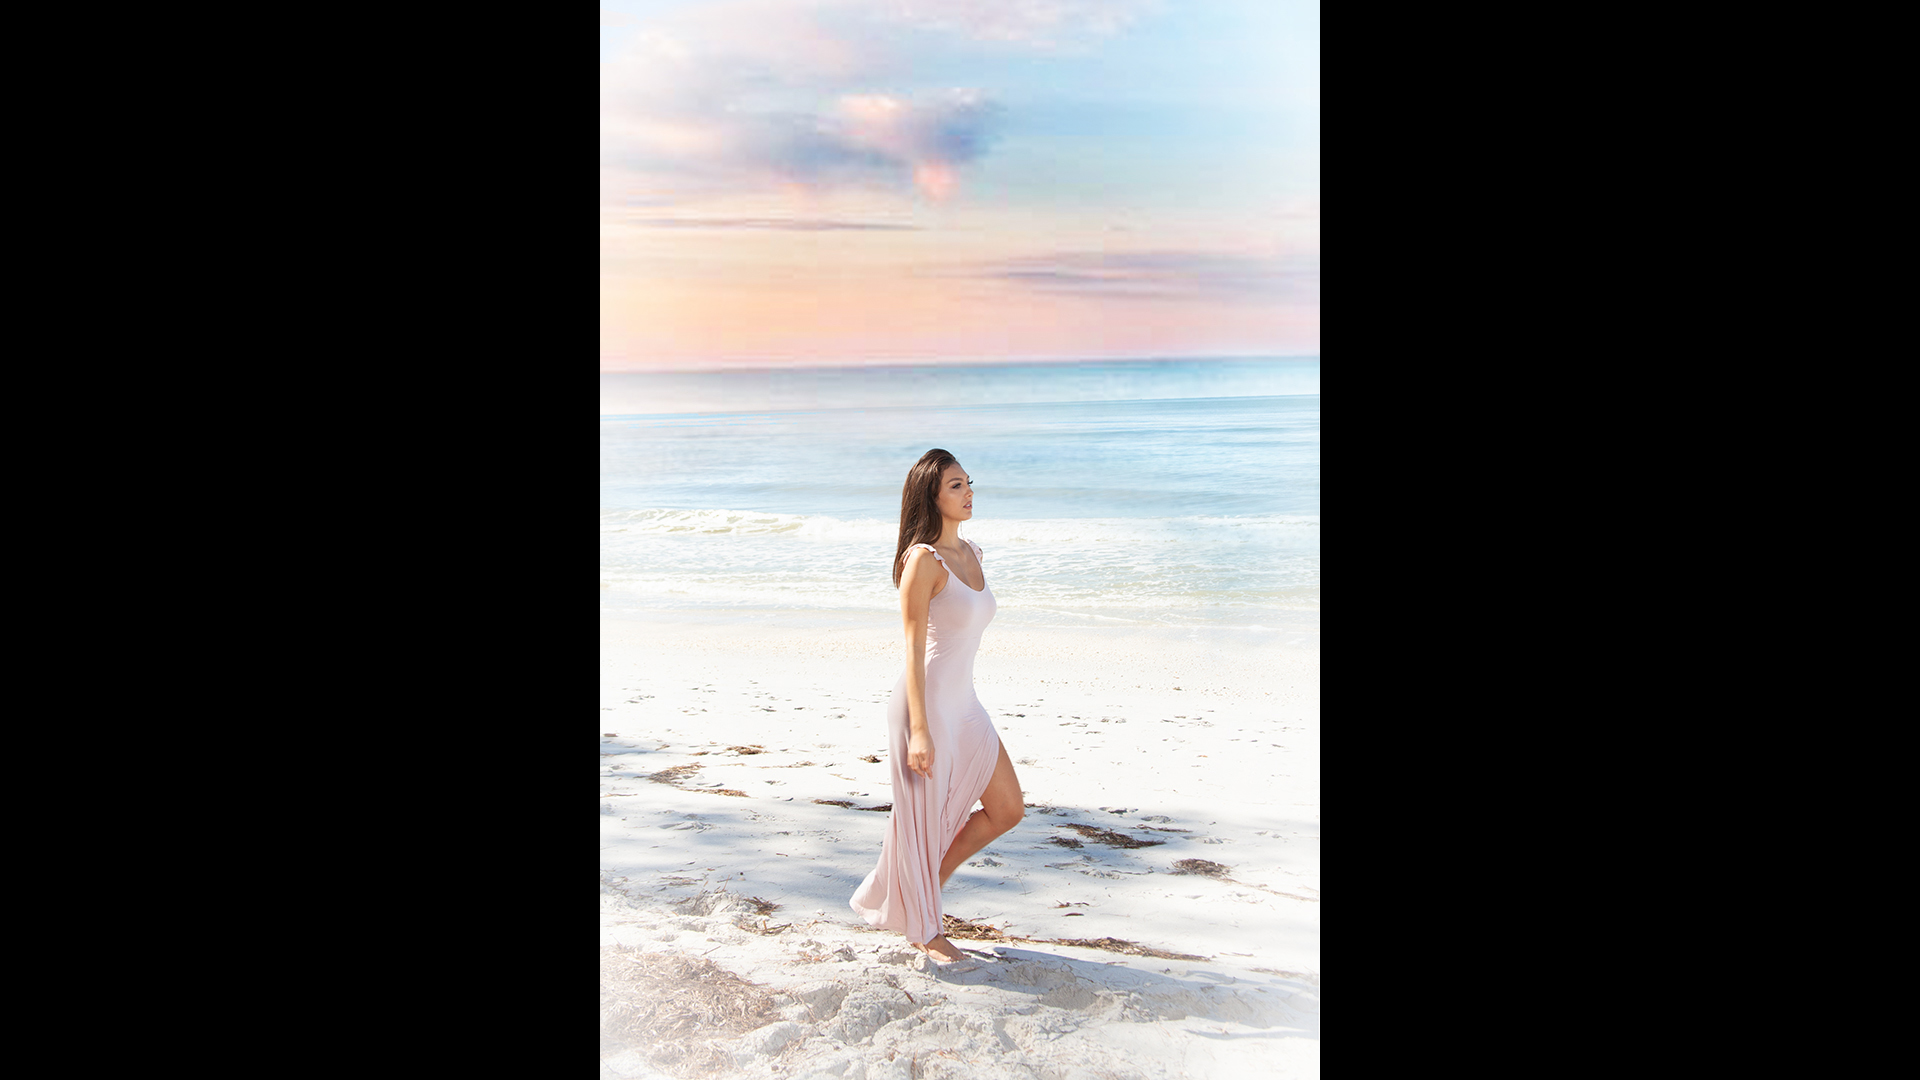 lauren beach web 32.jpg